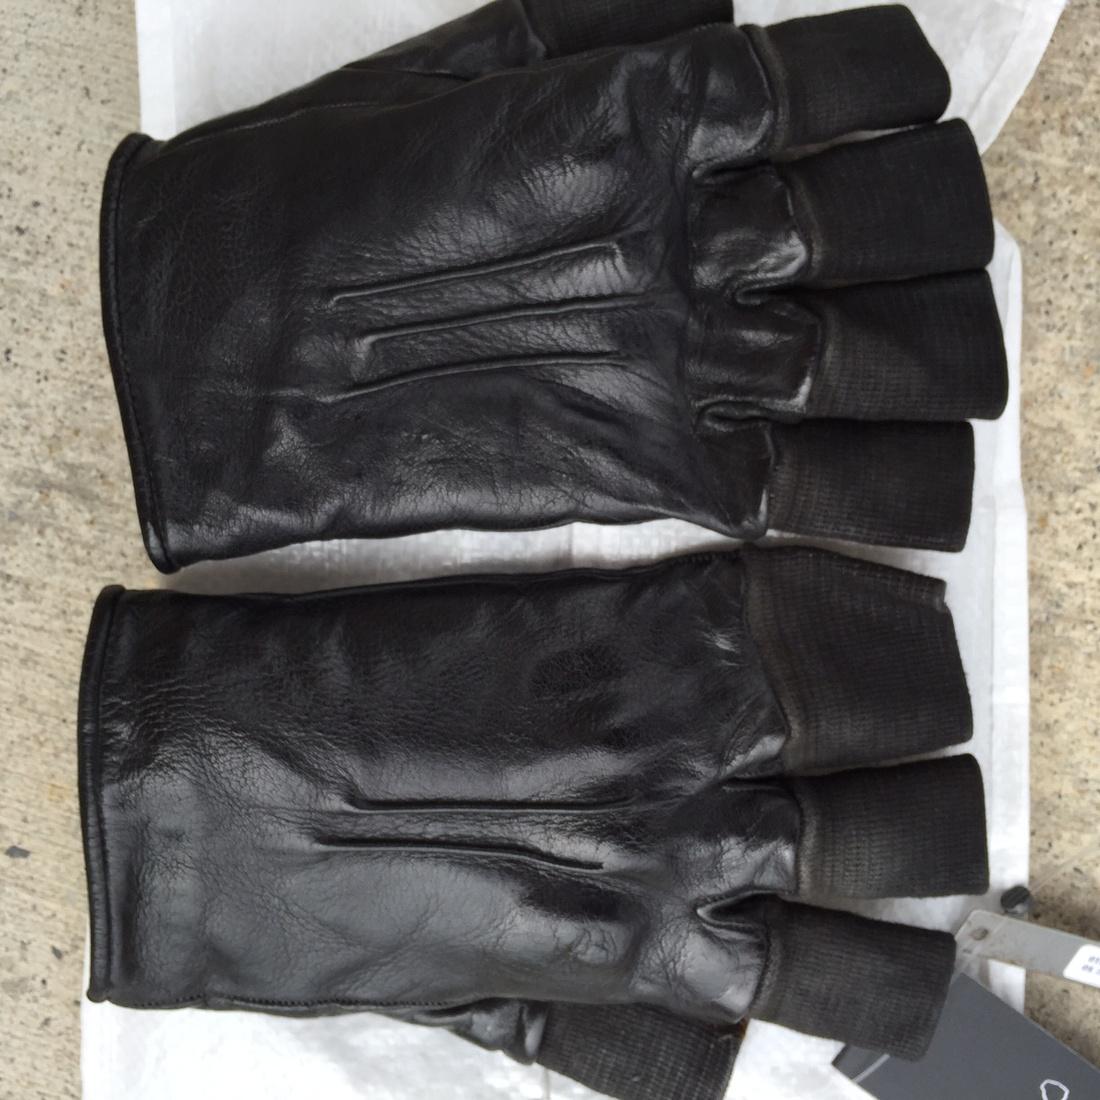 Black leather cut off gloves - Black Leather Cut Off Gloves